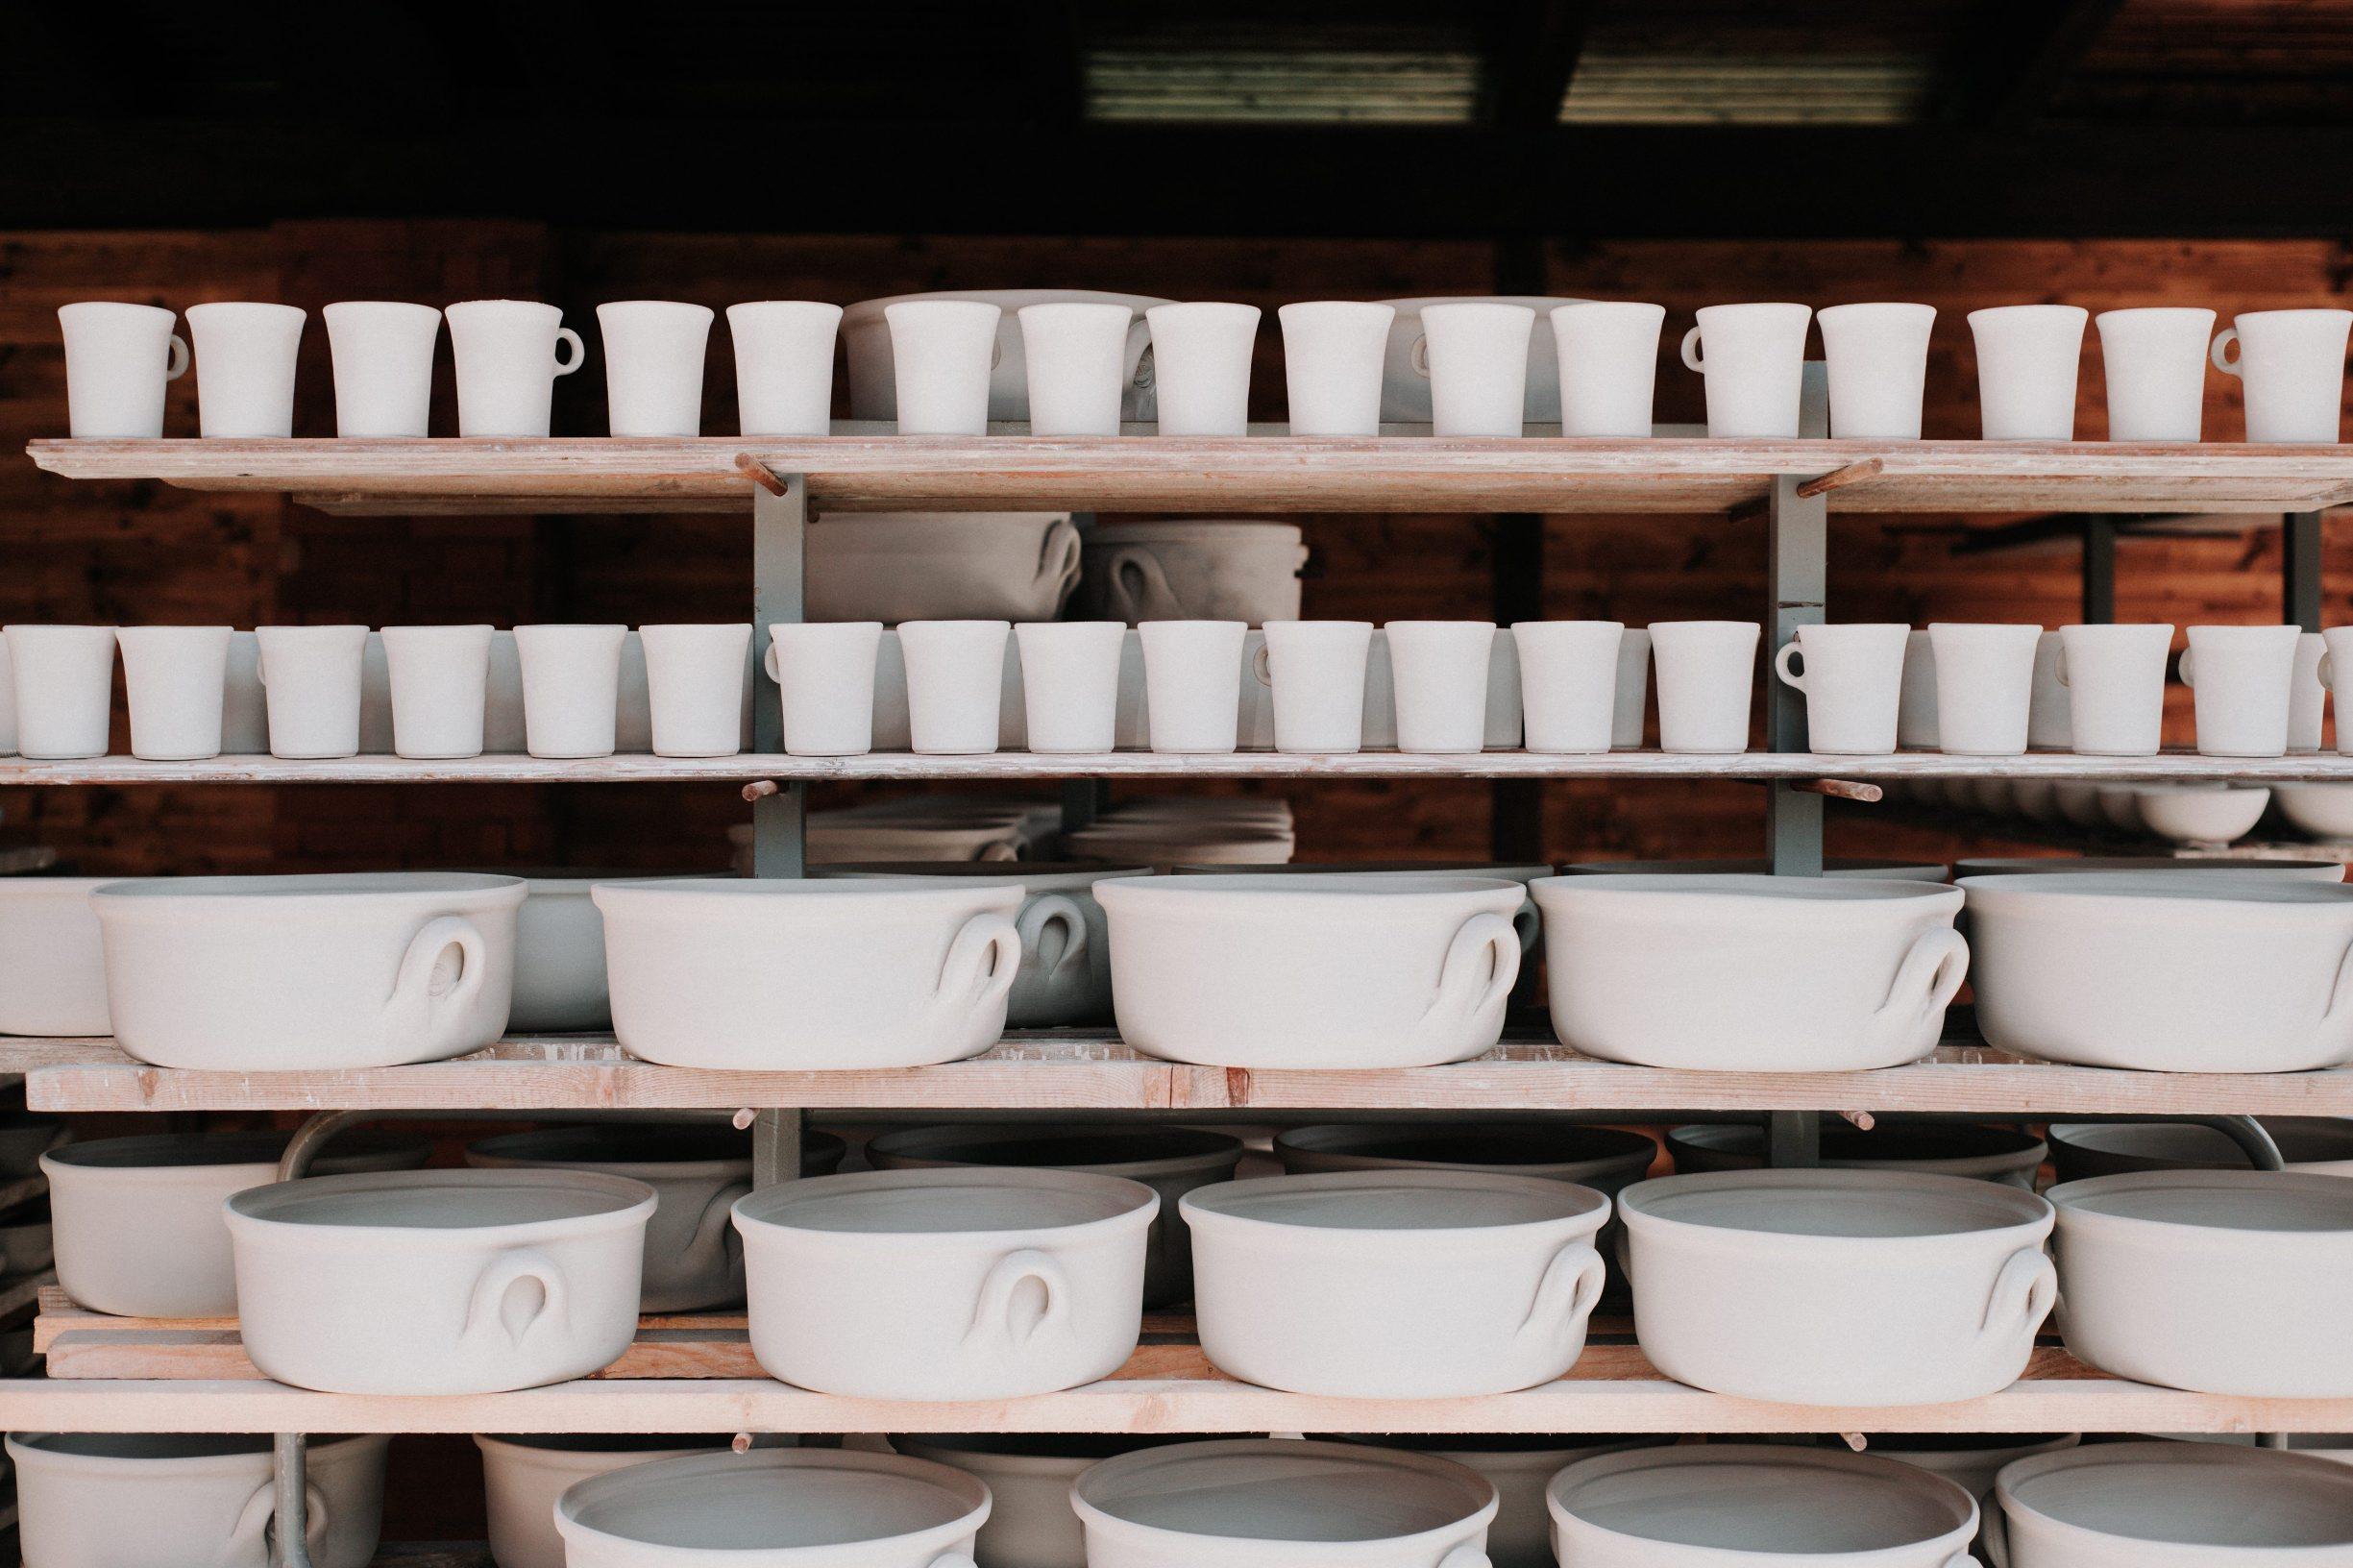 Ivanec, 210819. Obrt Keramika Mecena, gdje se tradicionalnim metodama proizvodi posude od keramike. Foto: Marko Miscevic / Cropix